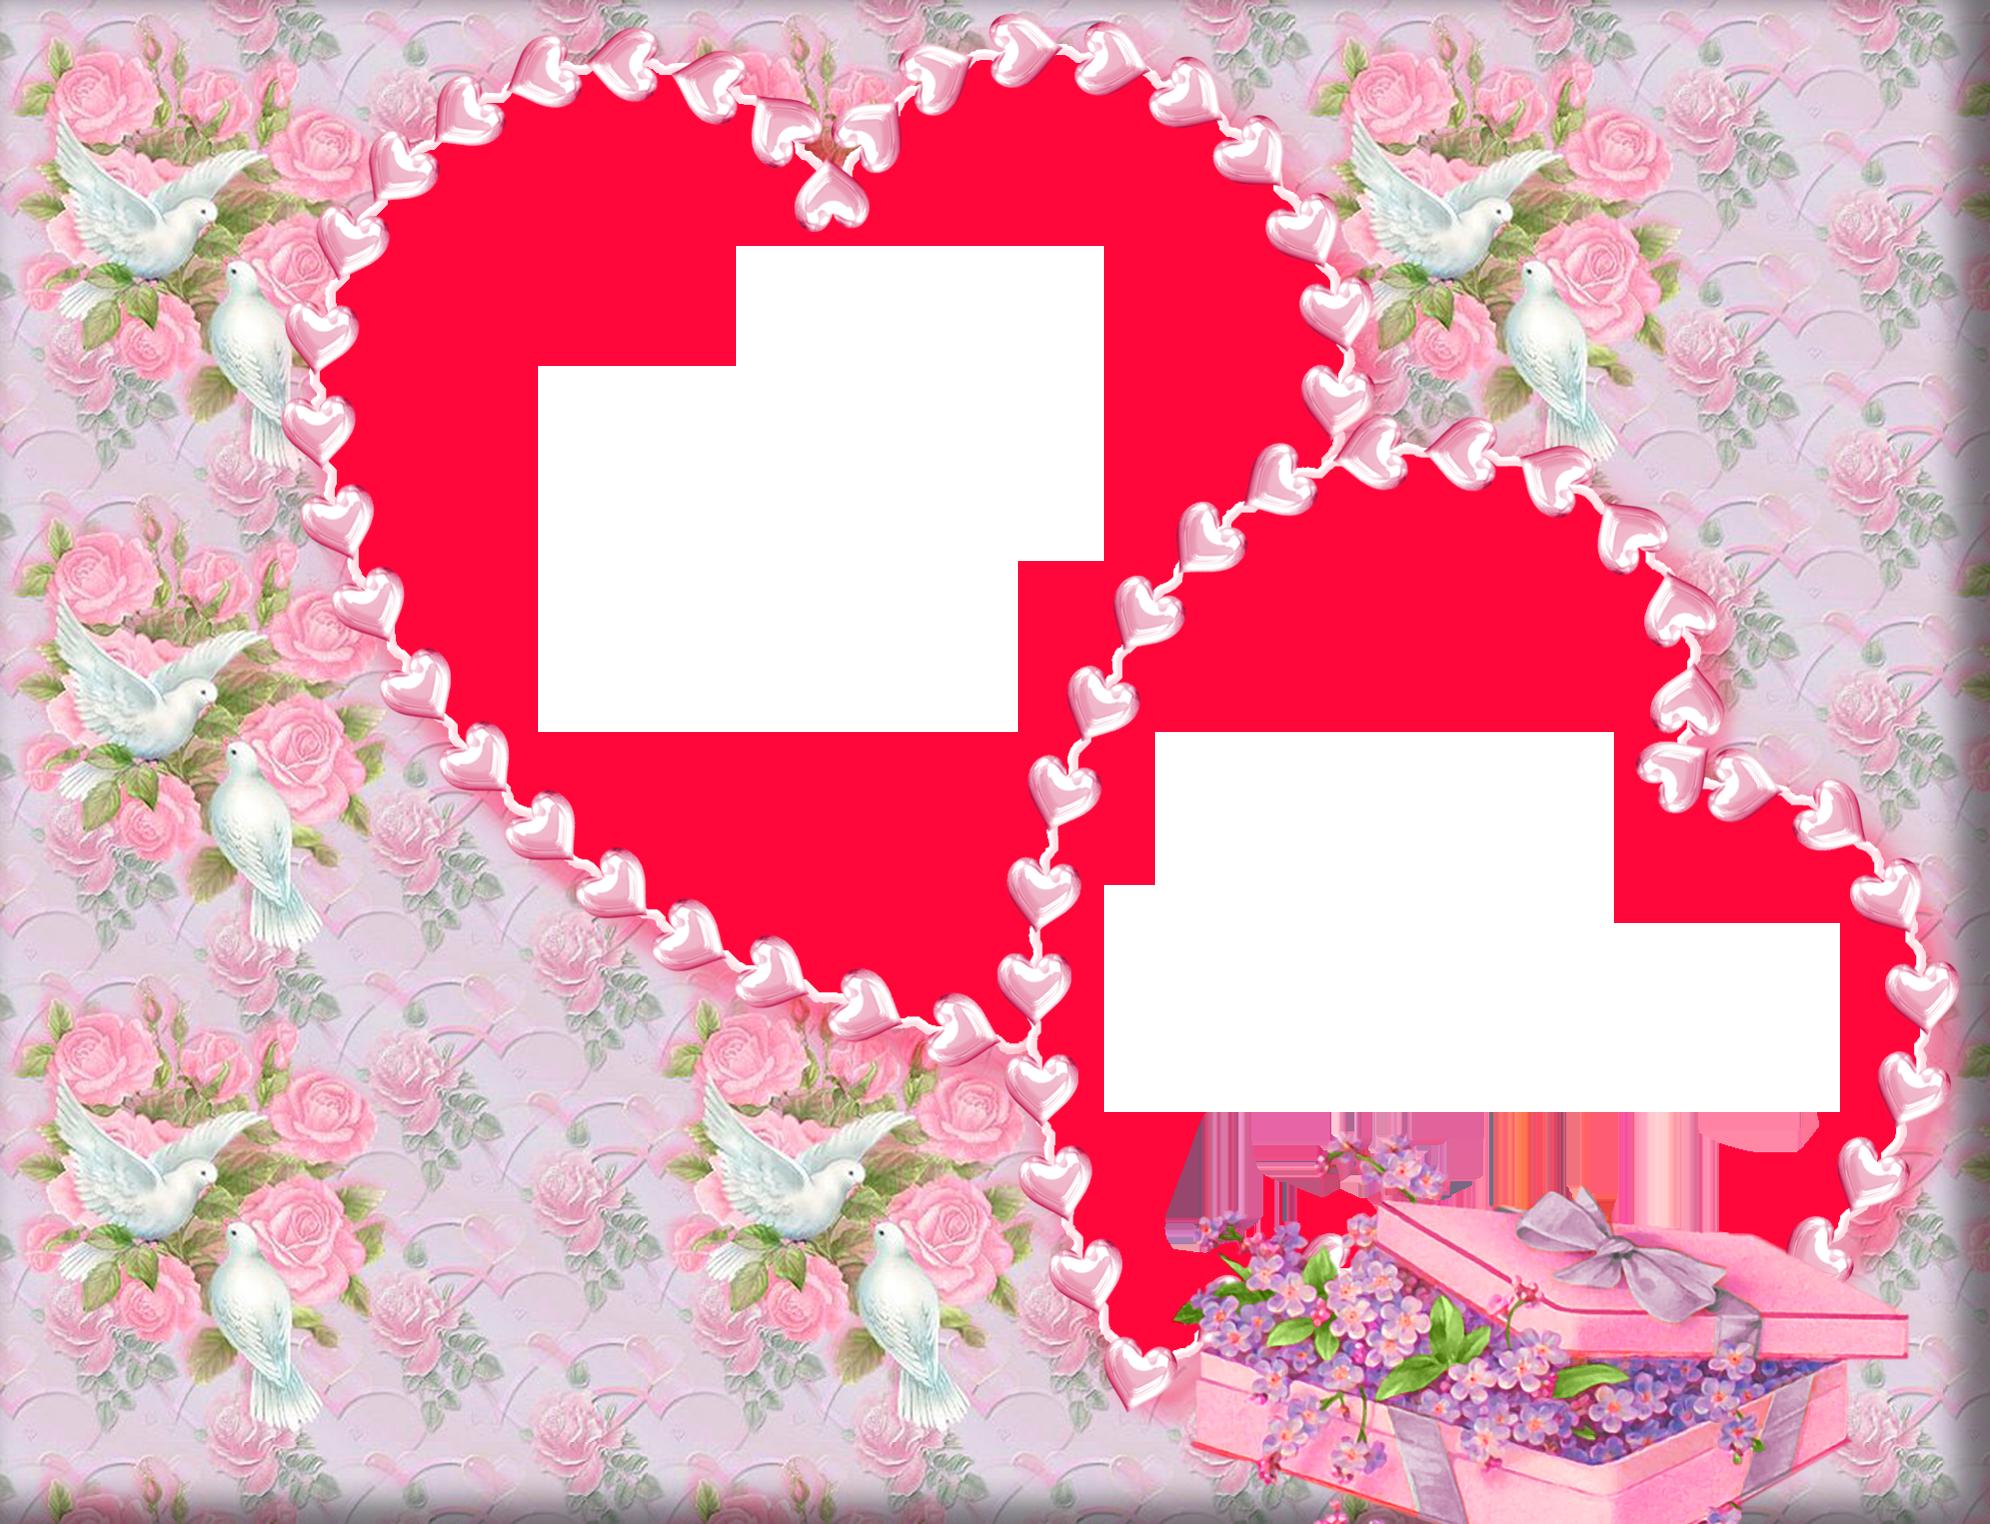 typography hearts meli schreiber - photo #11